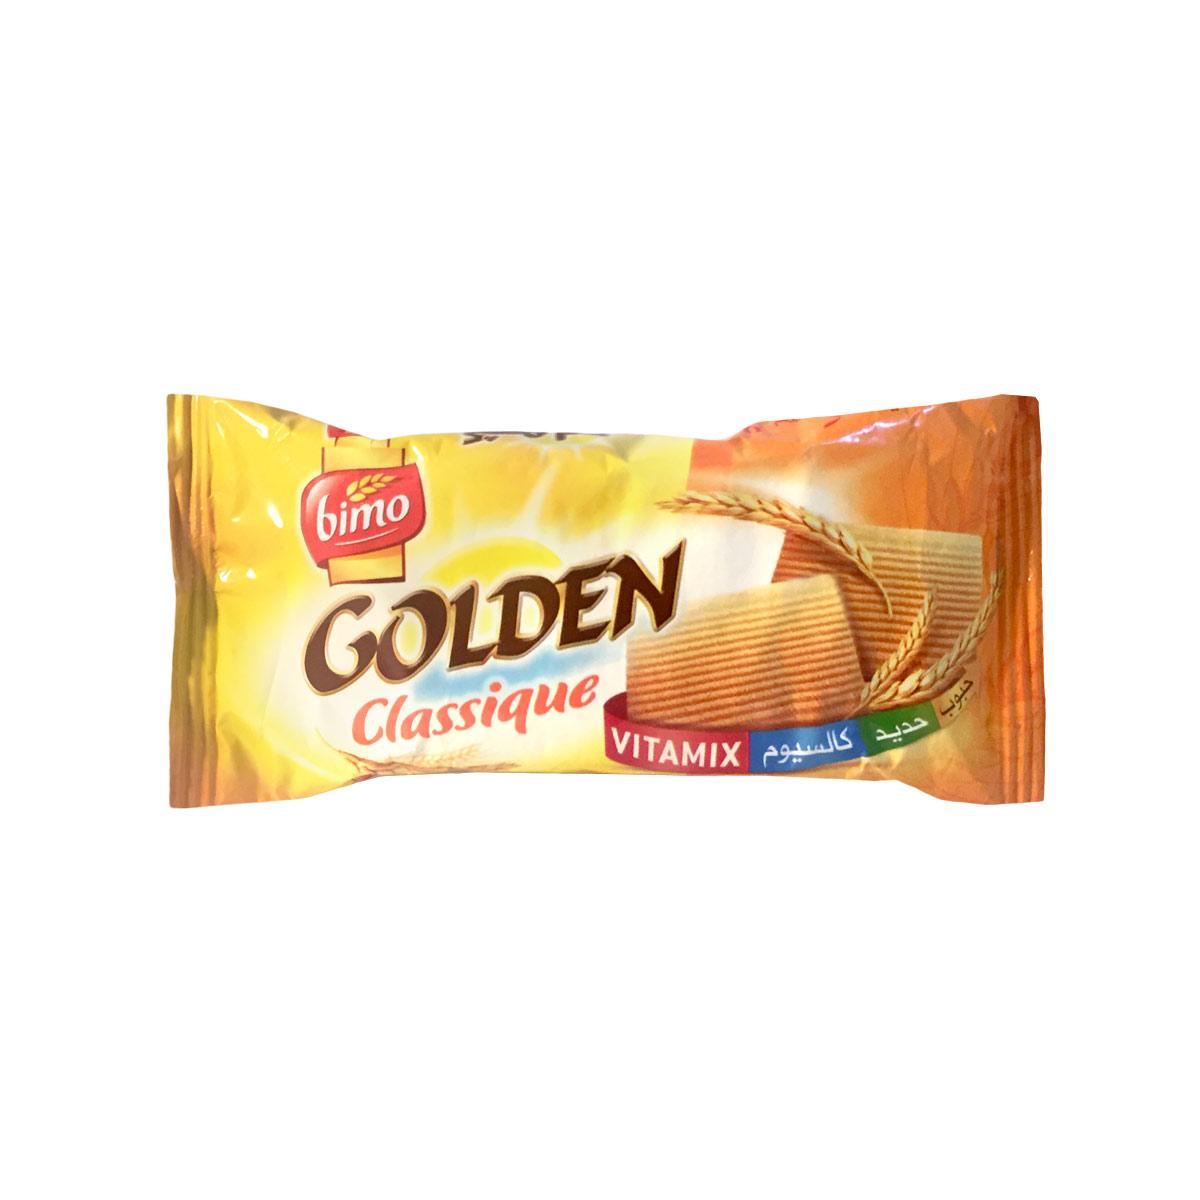 biscuits-bimo-golden-classique1 (1)